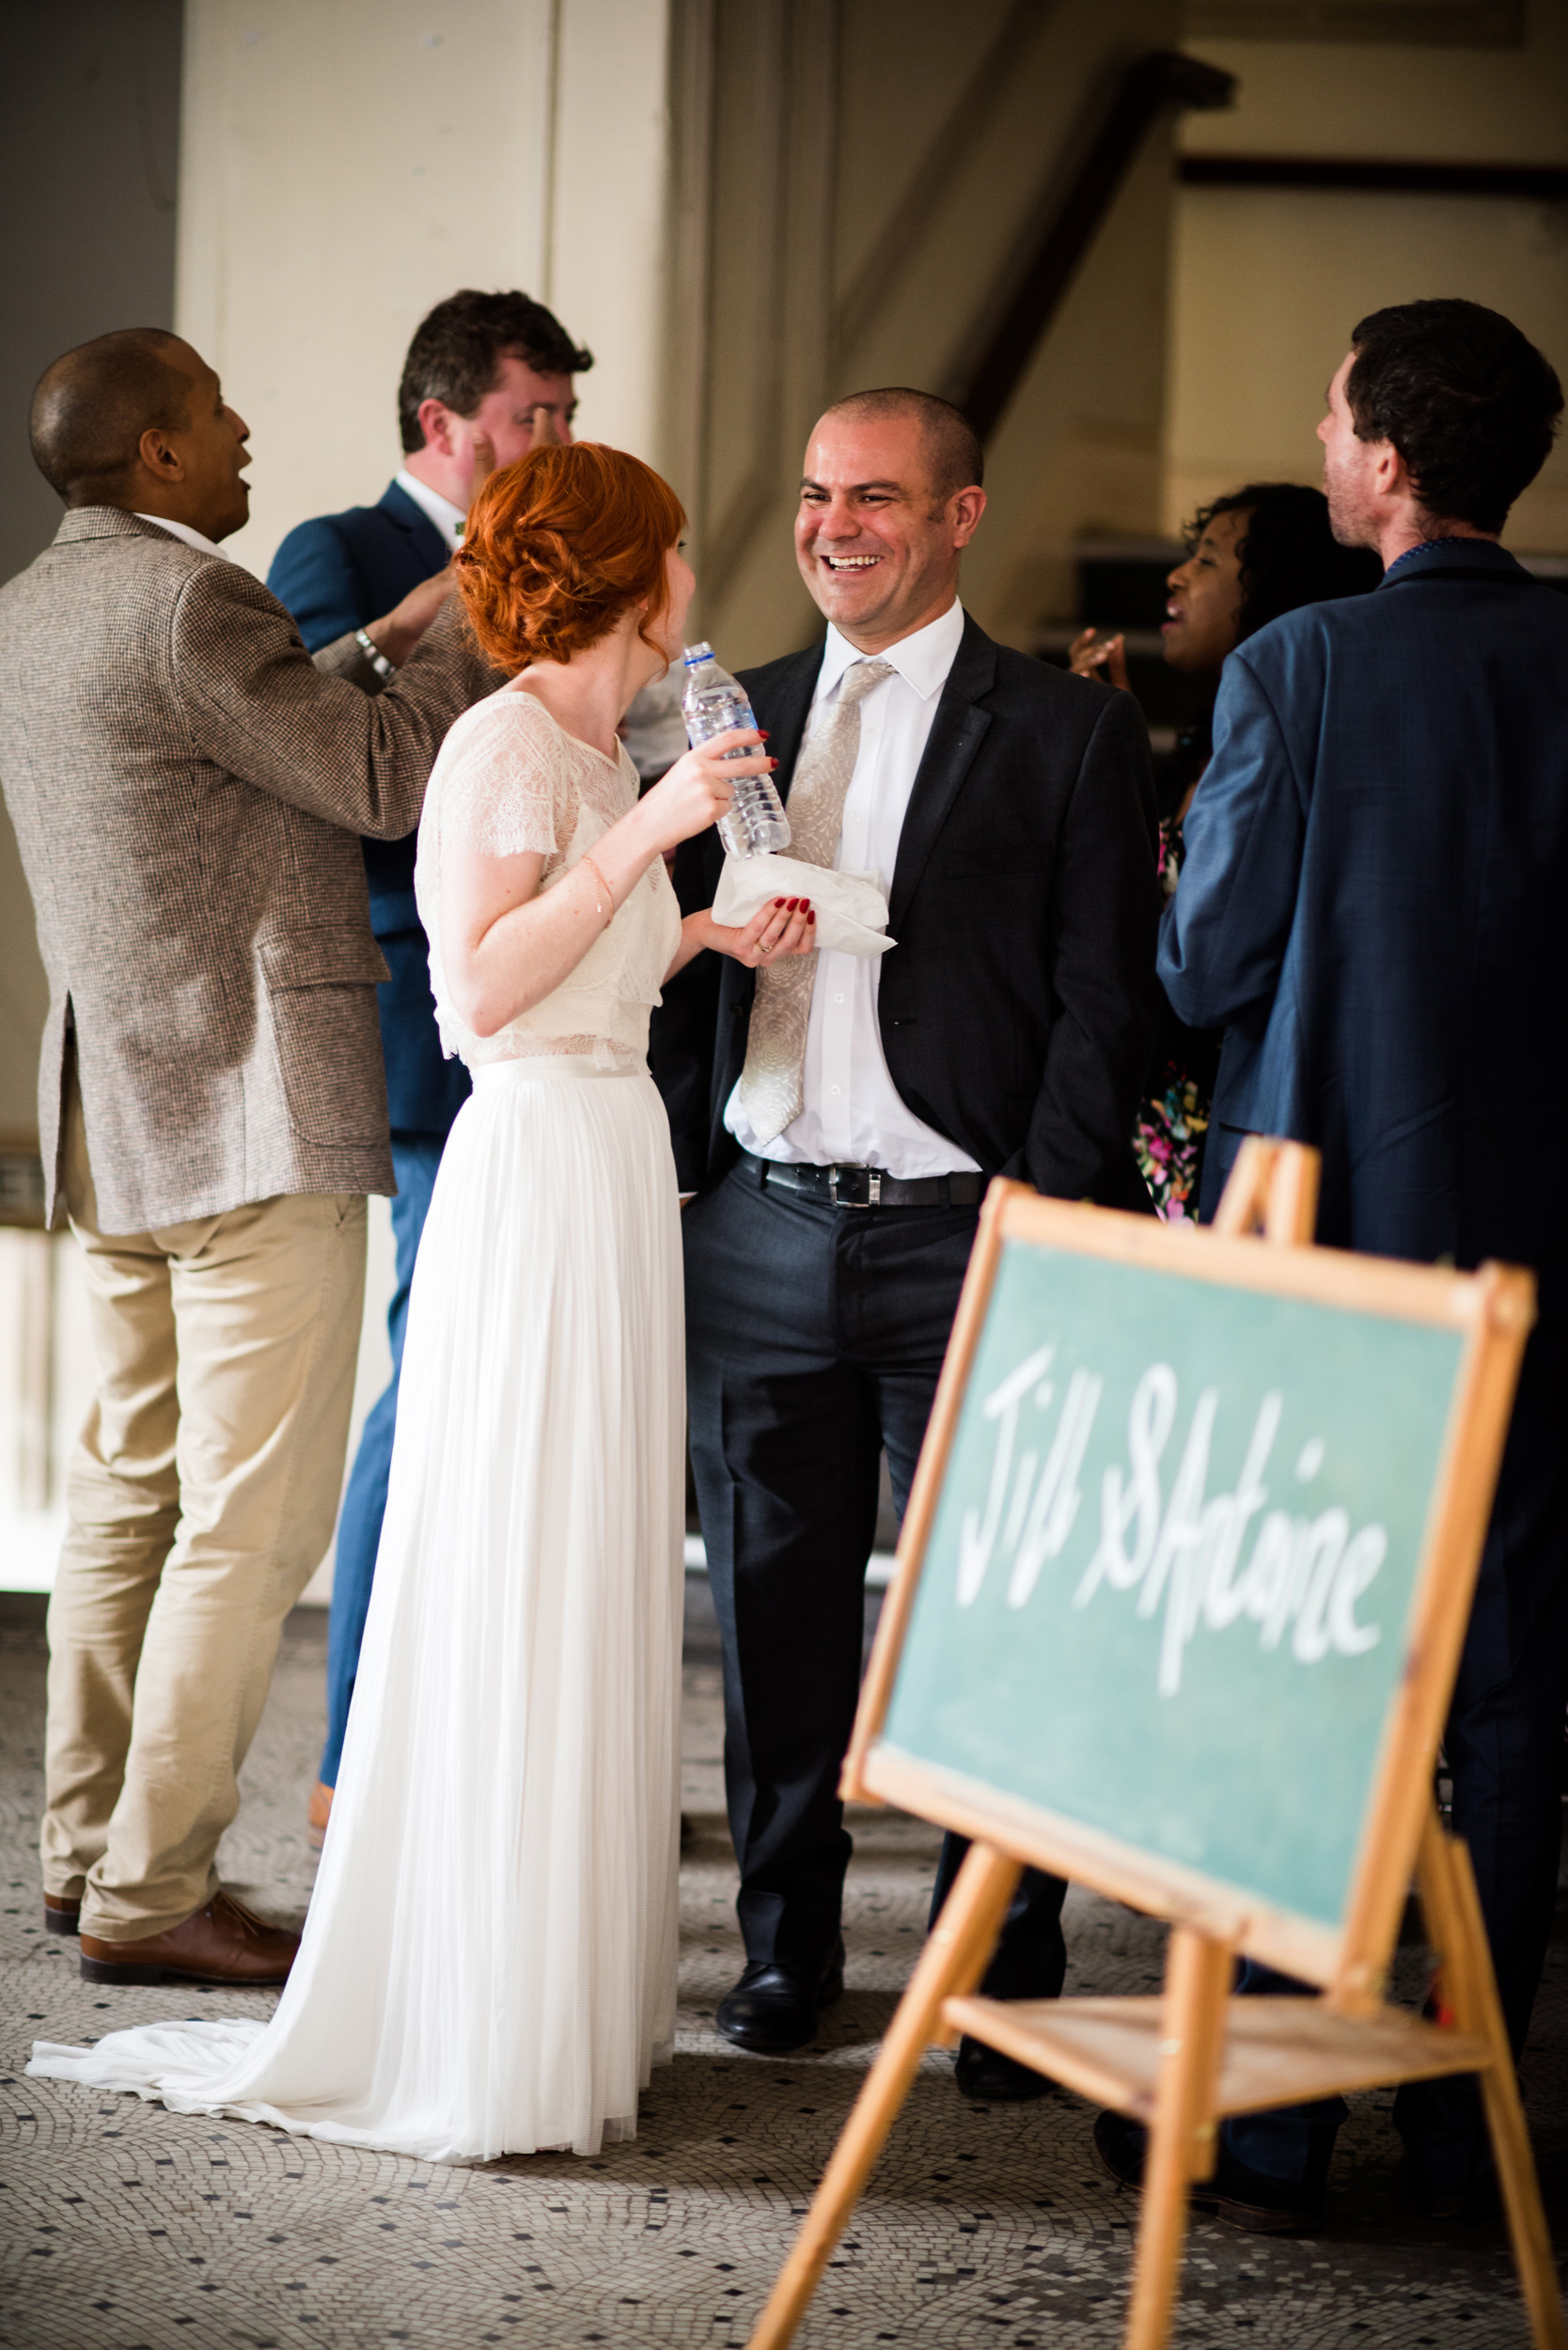 Jill-Kate-Beaumont-Lace-Sheffield-Wedding-12.jpg